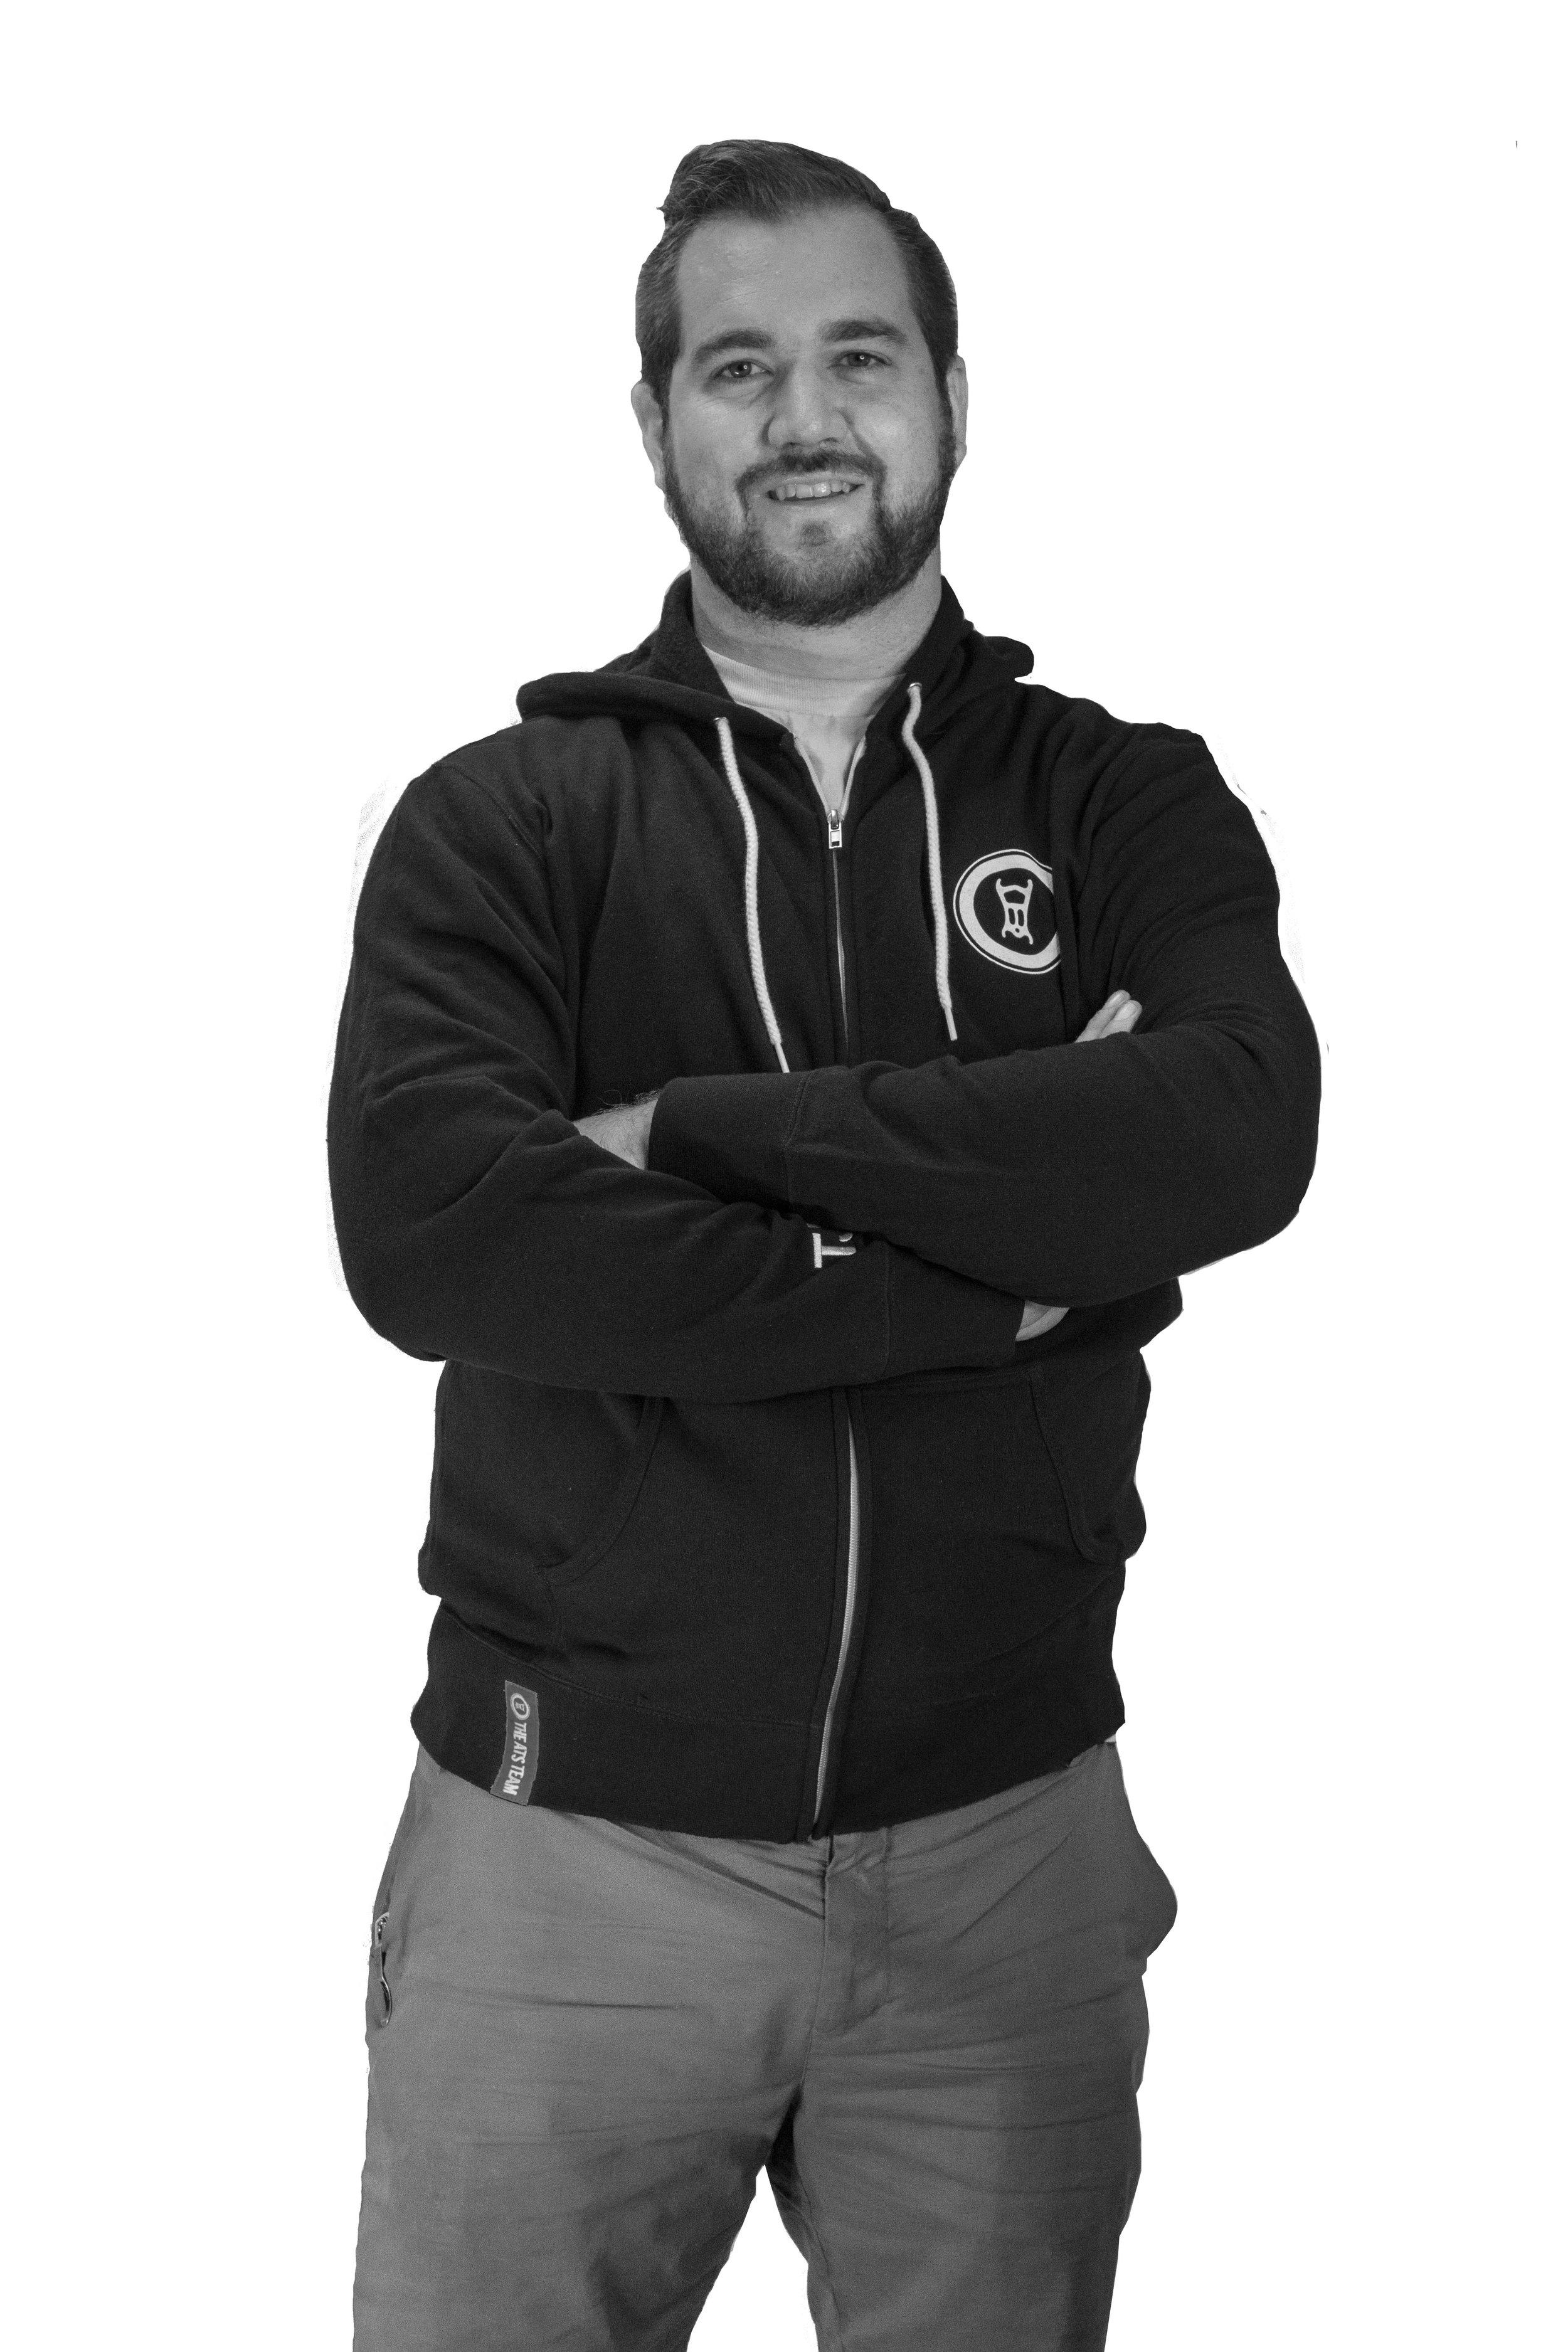 Dan Allende - Head of Production Control